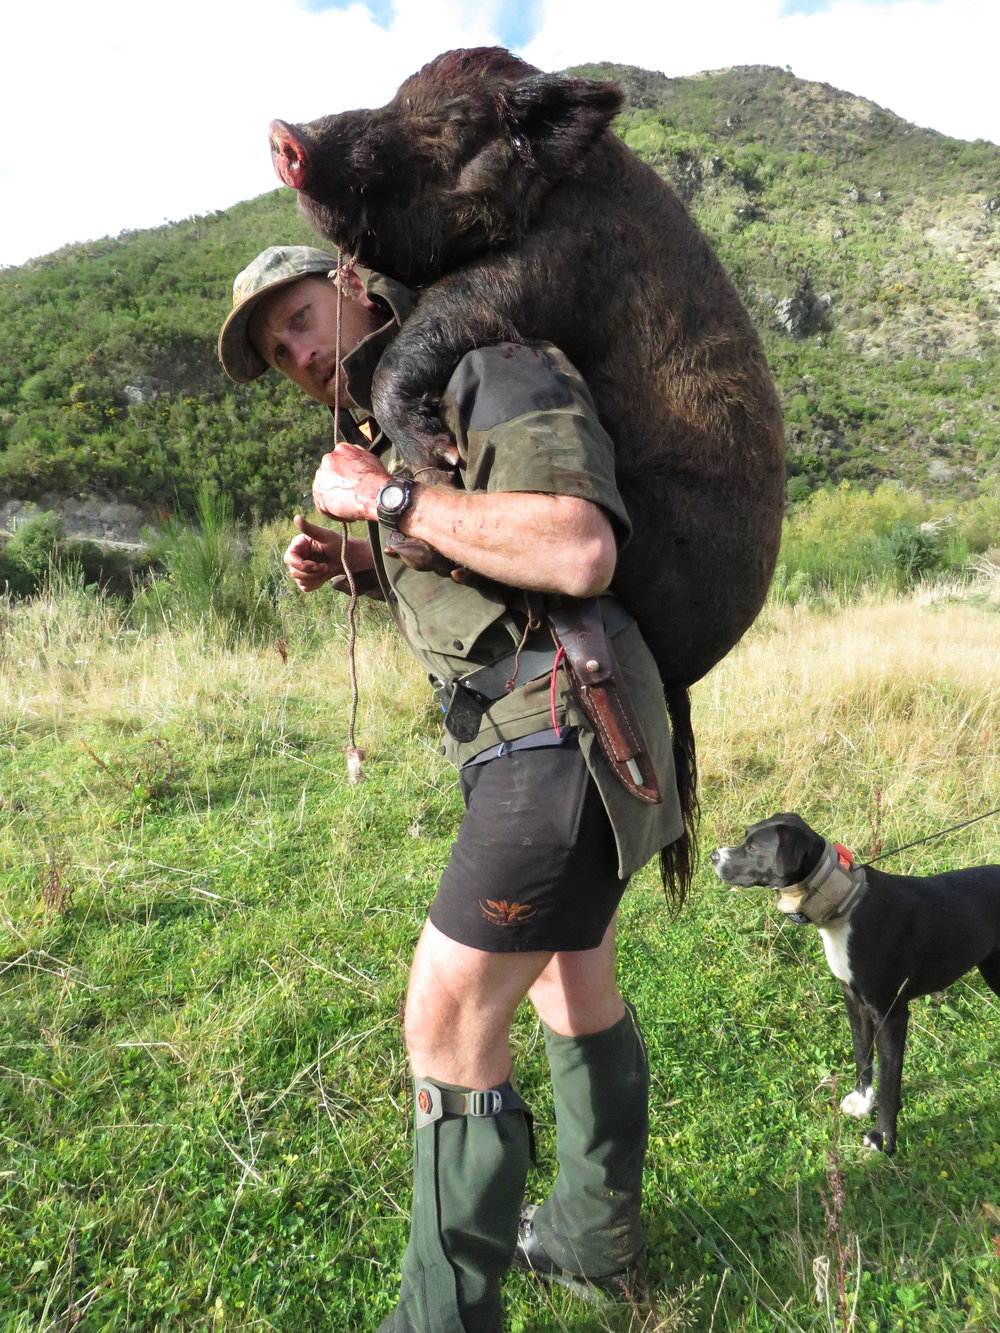 Shaun Monk teaching those knee's a lesson.